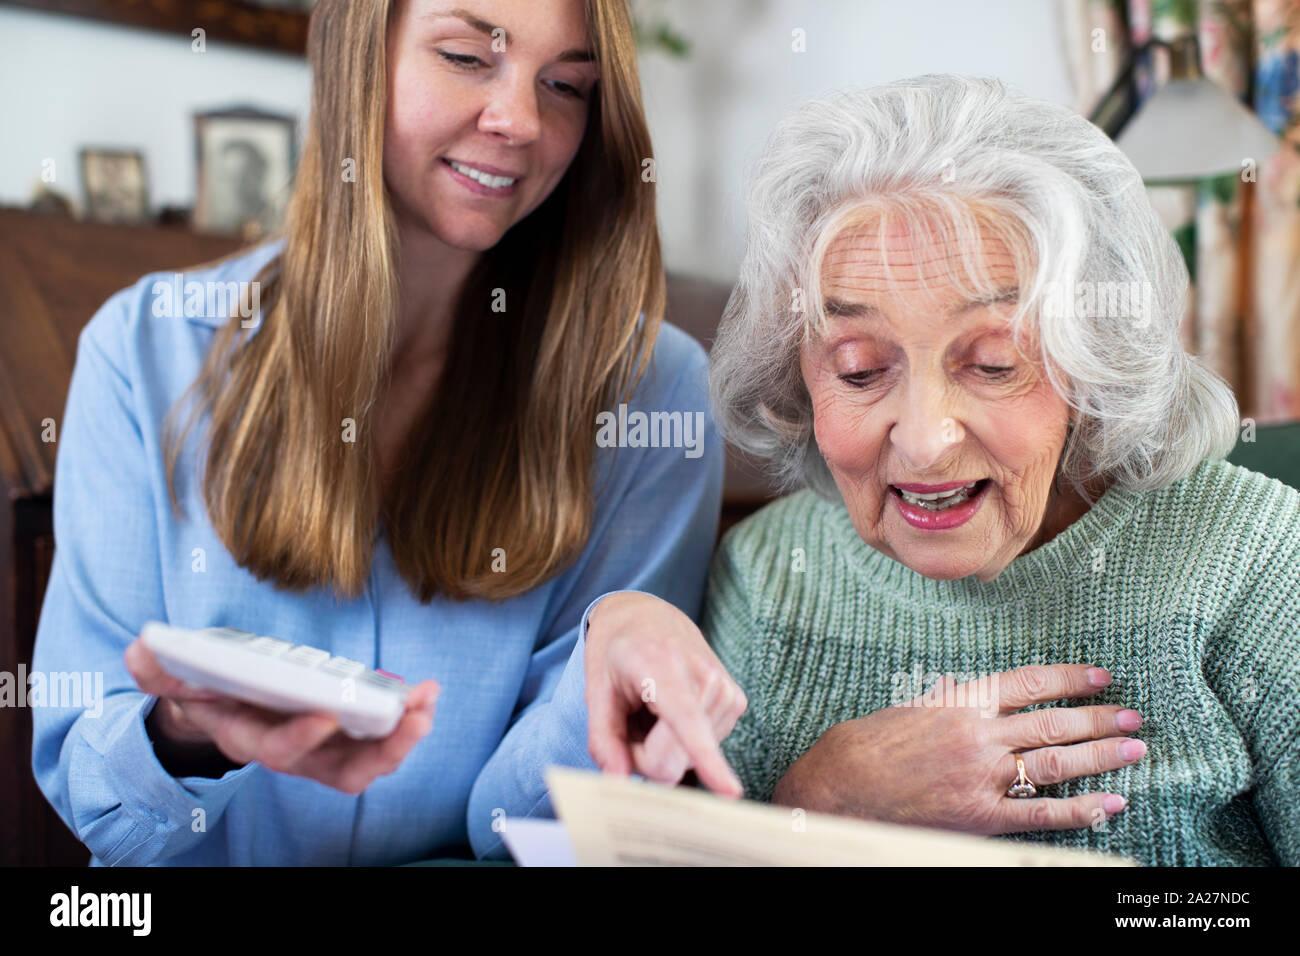 Woman Helping Senior Neighbor With Bills And Paperwork Stock Photo